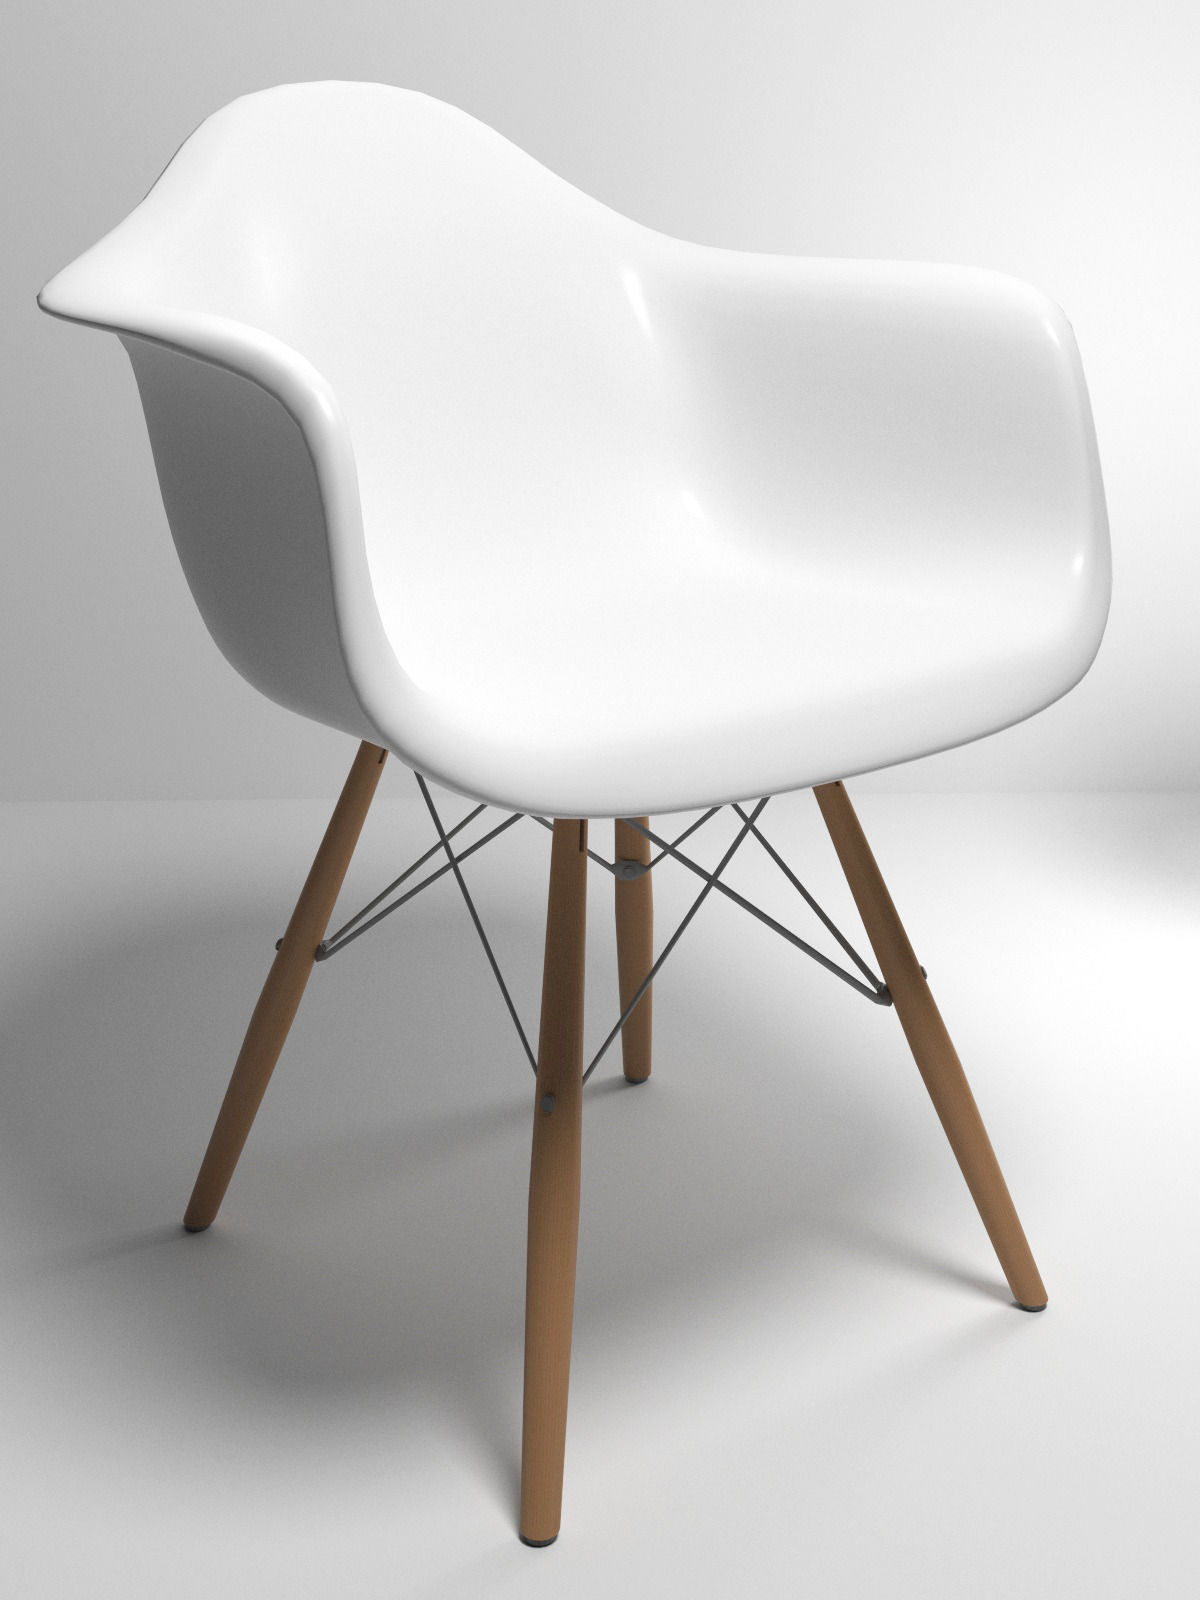 eames style plastic chair hanging egg queensland 3d molded cgtrader model max obj mtl 3ds fbx stl 1